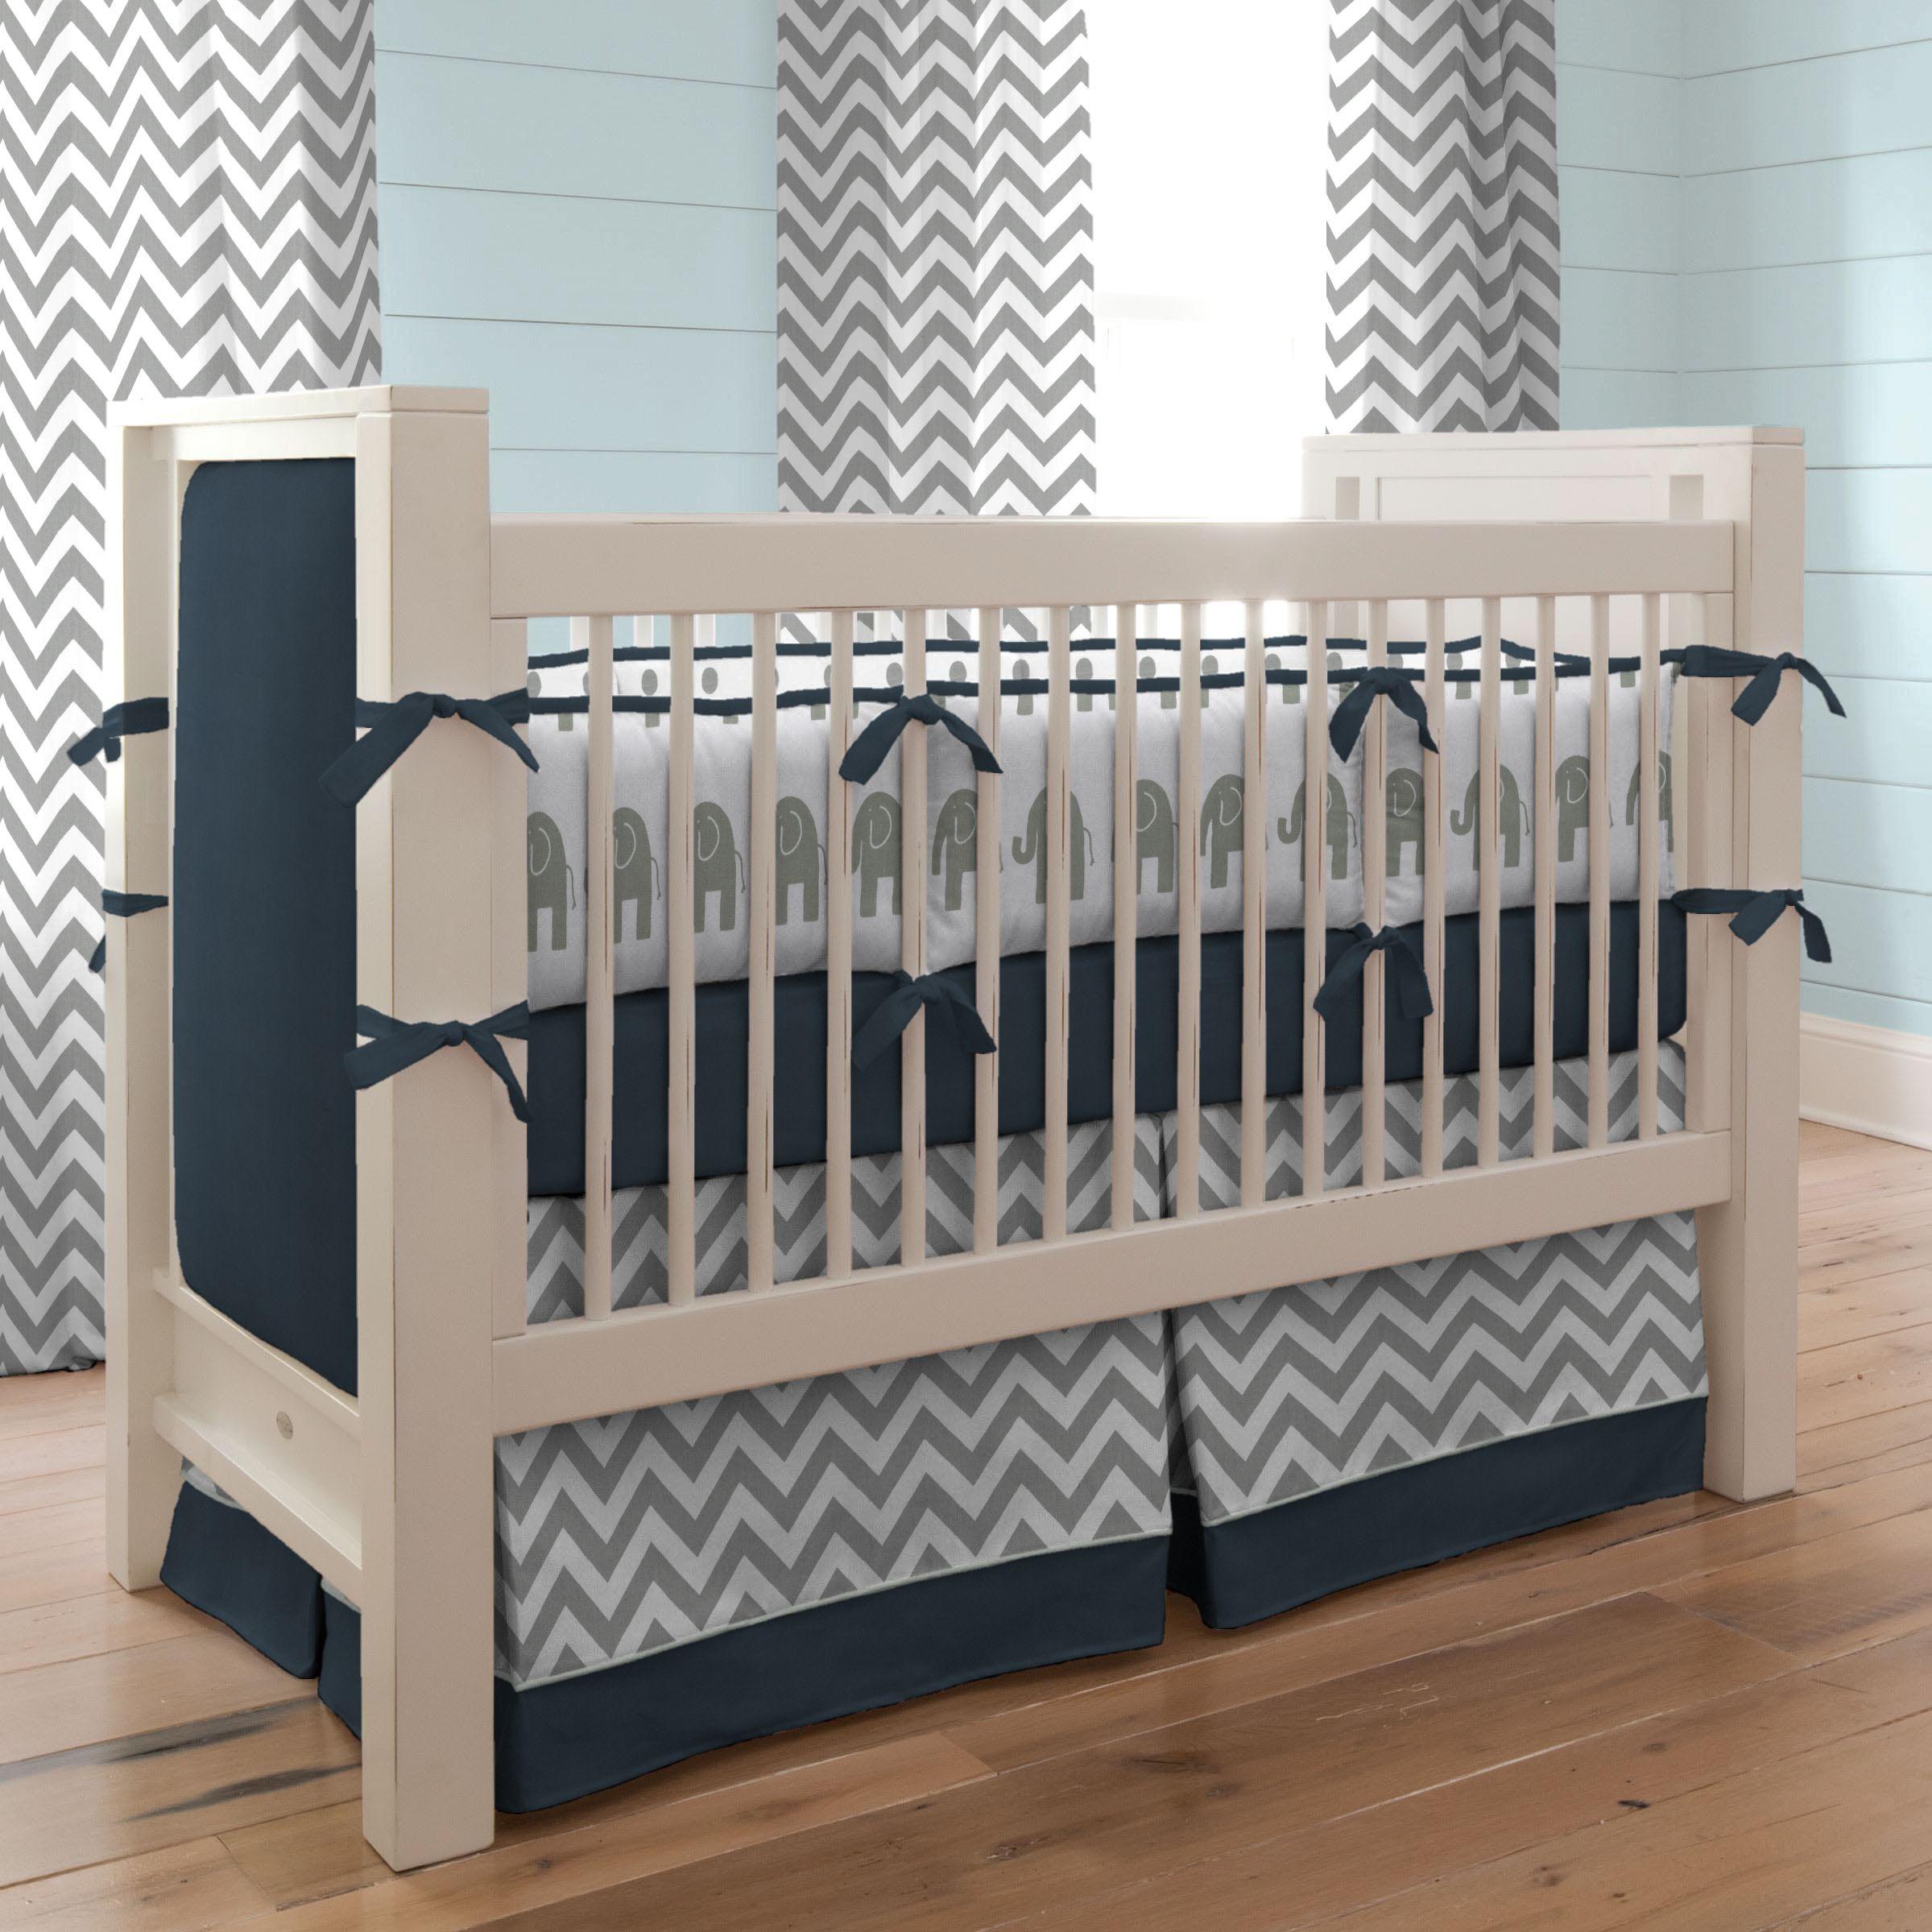 Navy and Gray Elephants Baby Crib Bedding | Grey elephant ...